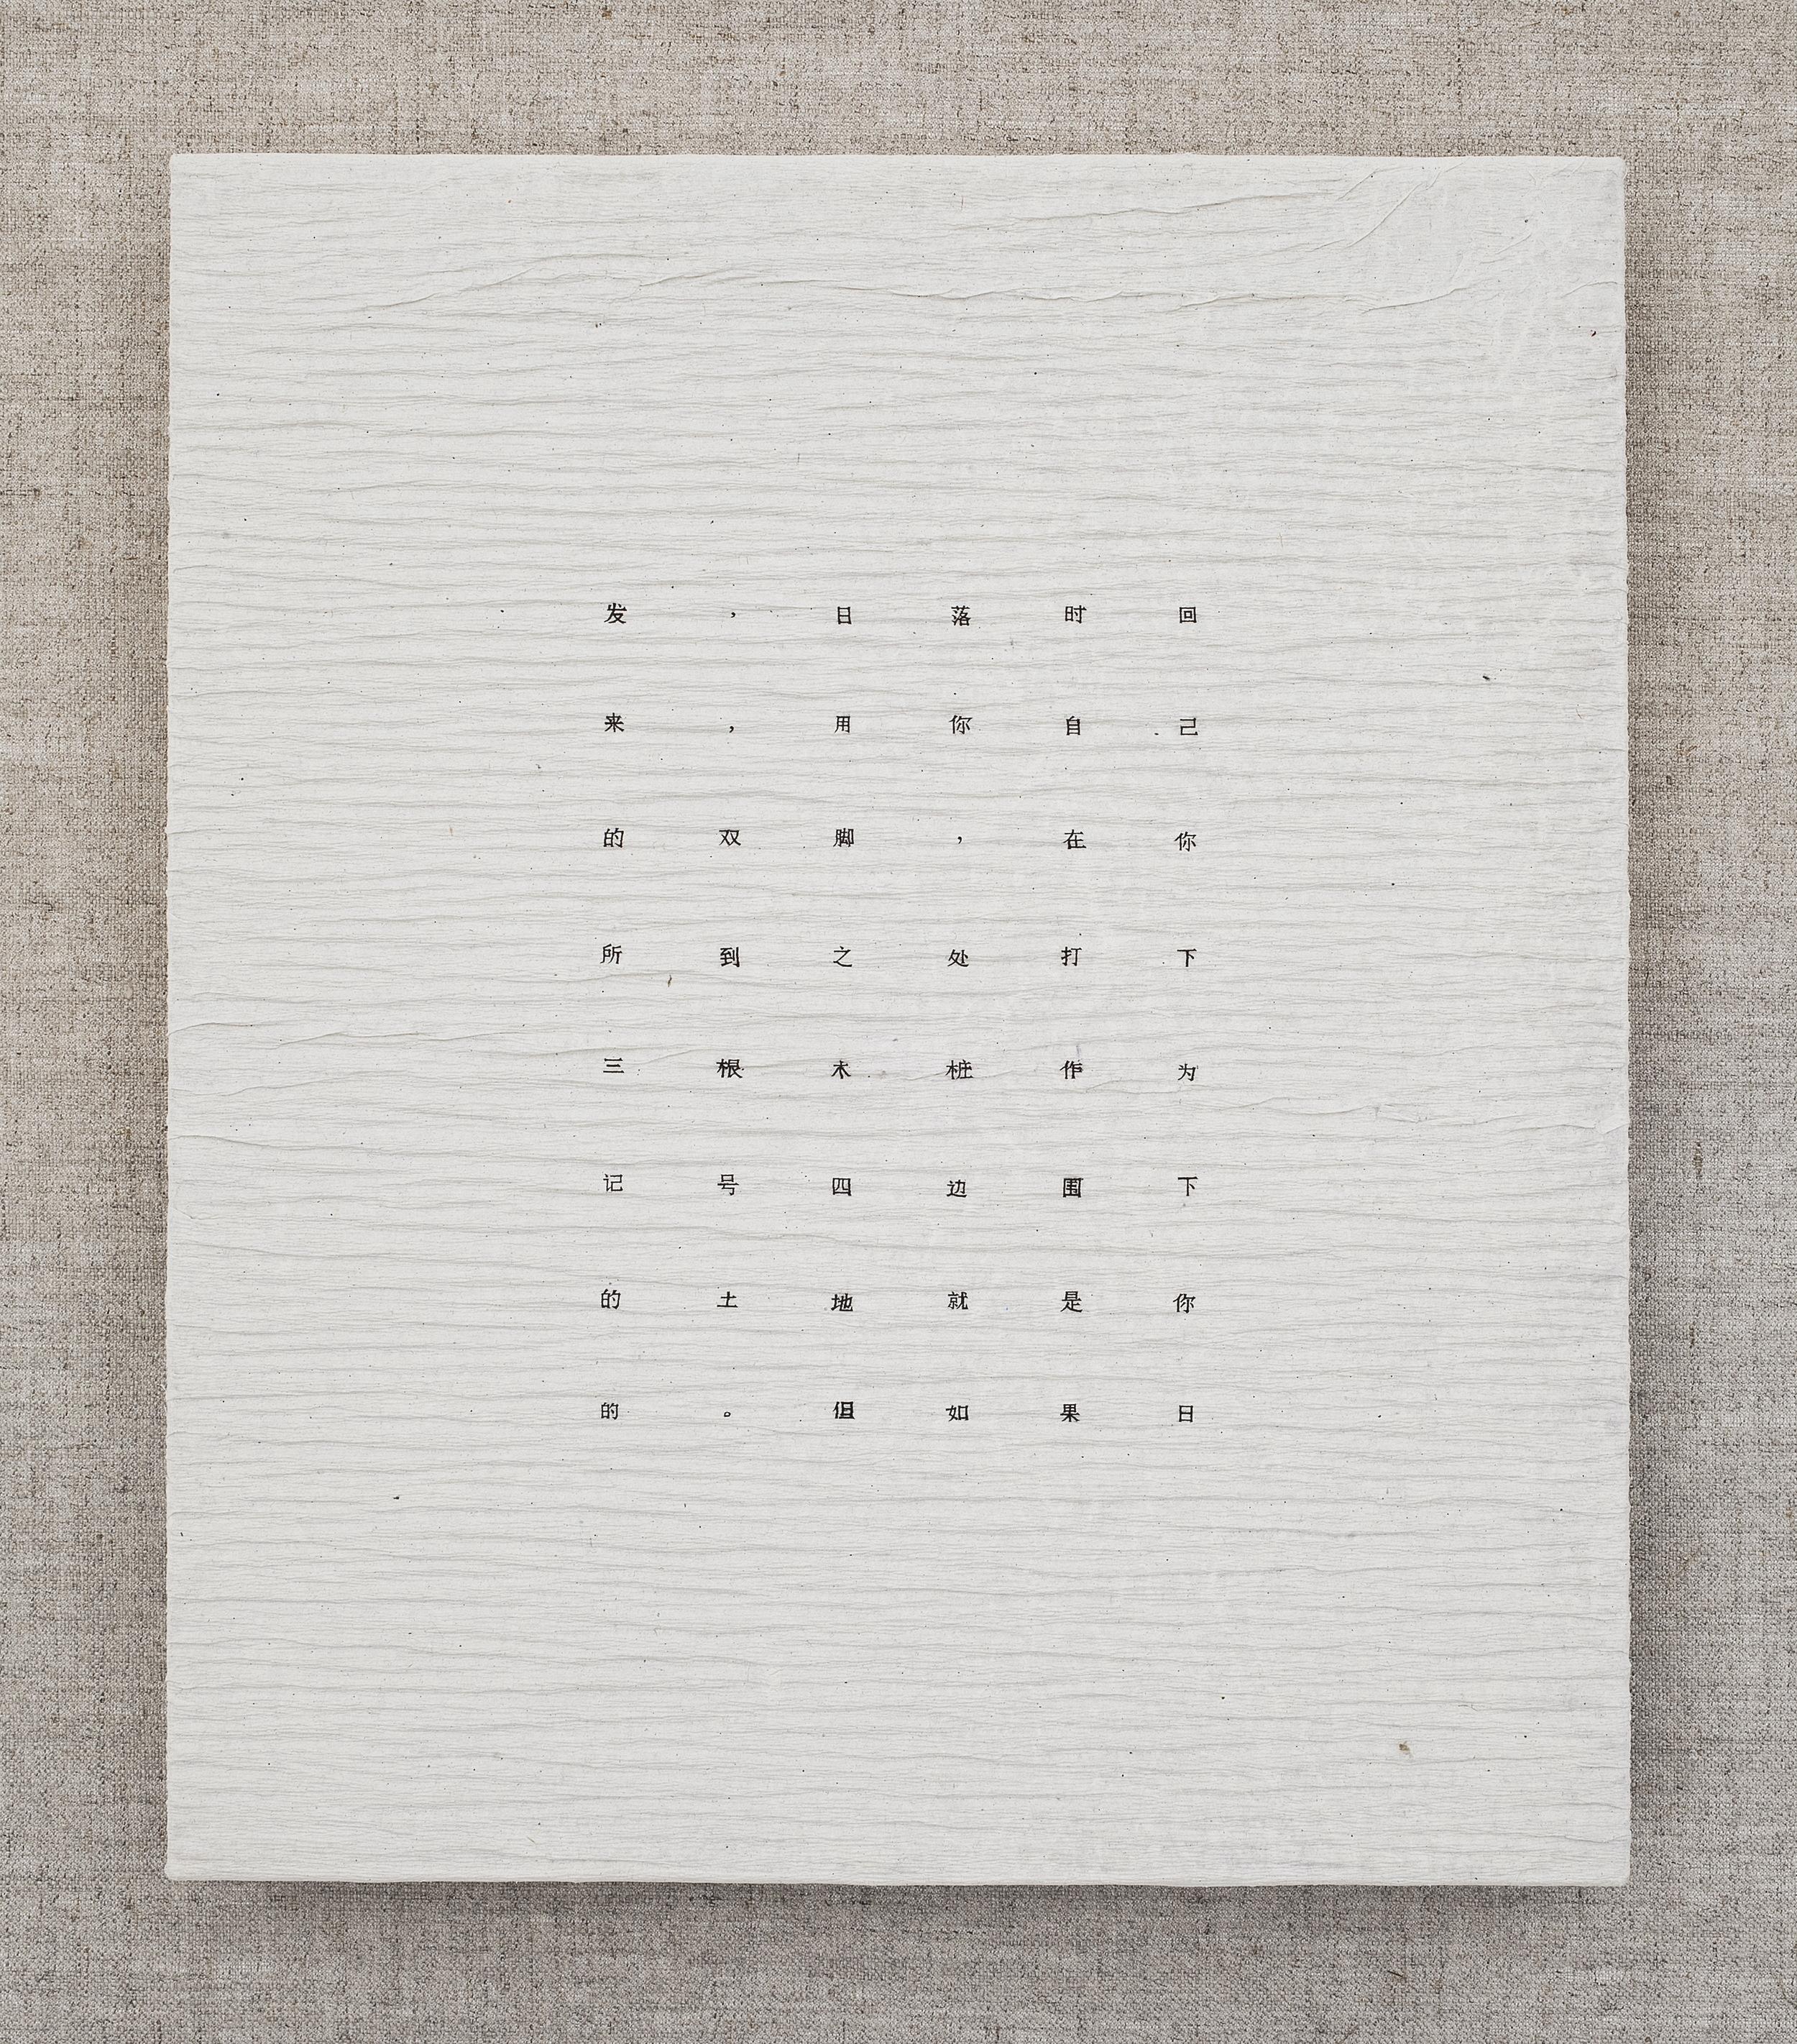 Liu Ren 刘任, How Much Land Does One Needs 一个人需要多少土地 (Detail, 局部)